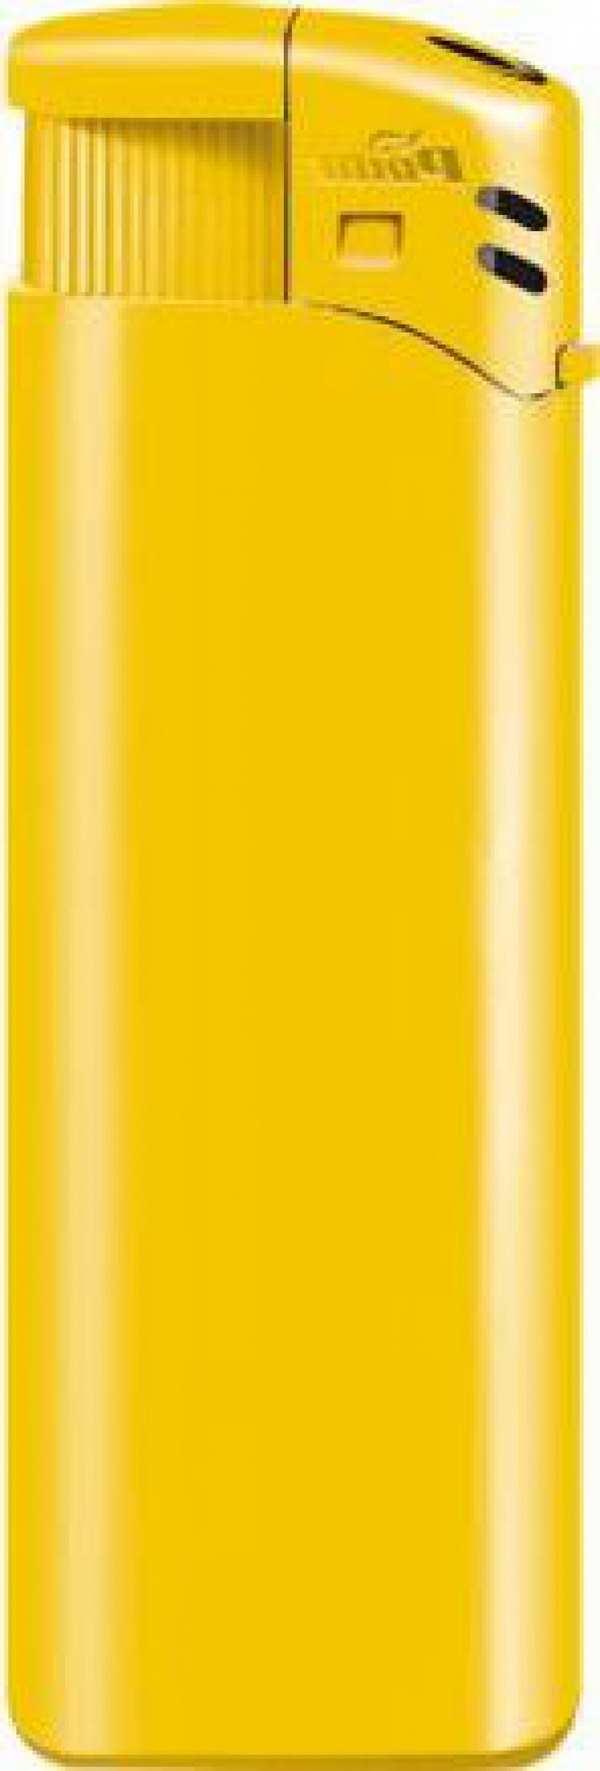 Зажигалка многоразовая Колор-100